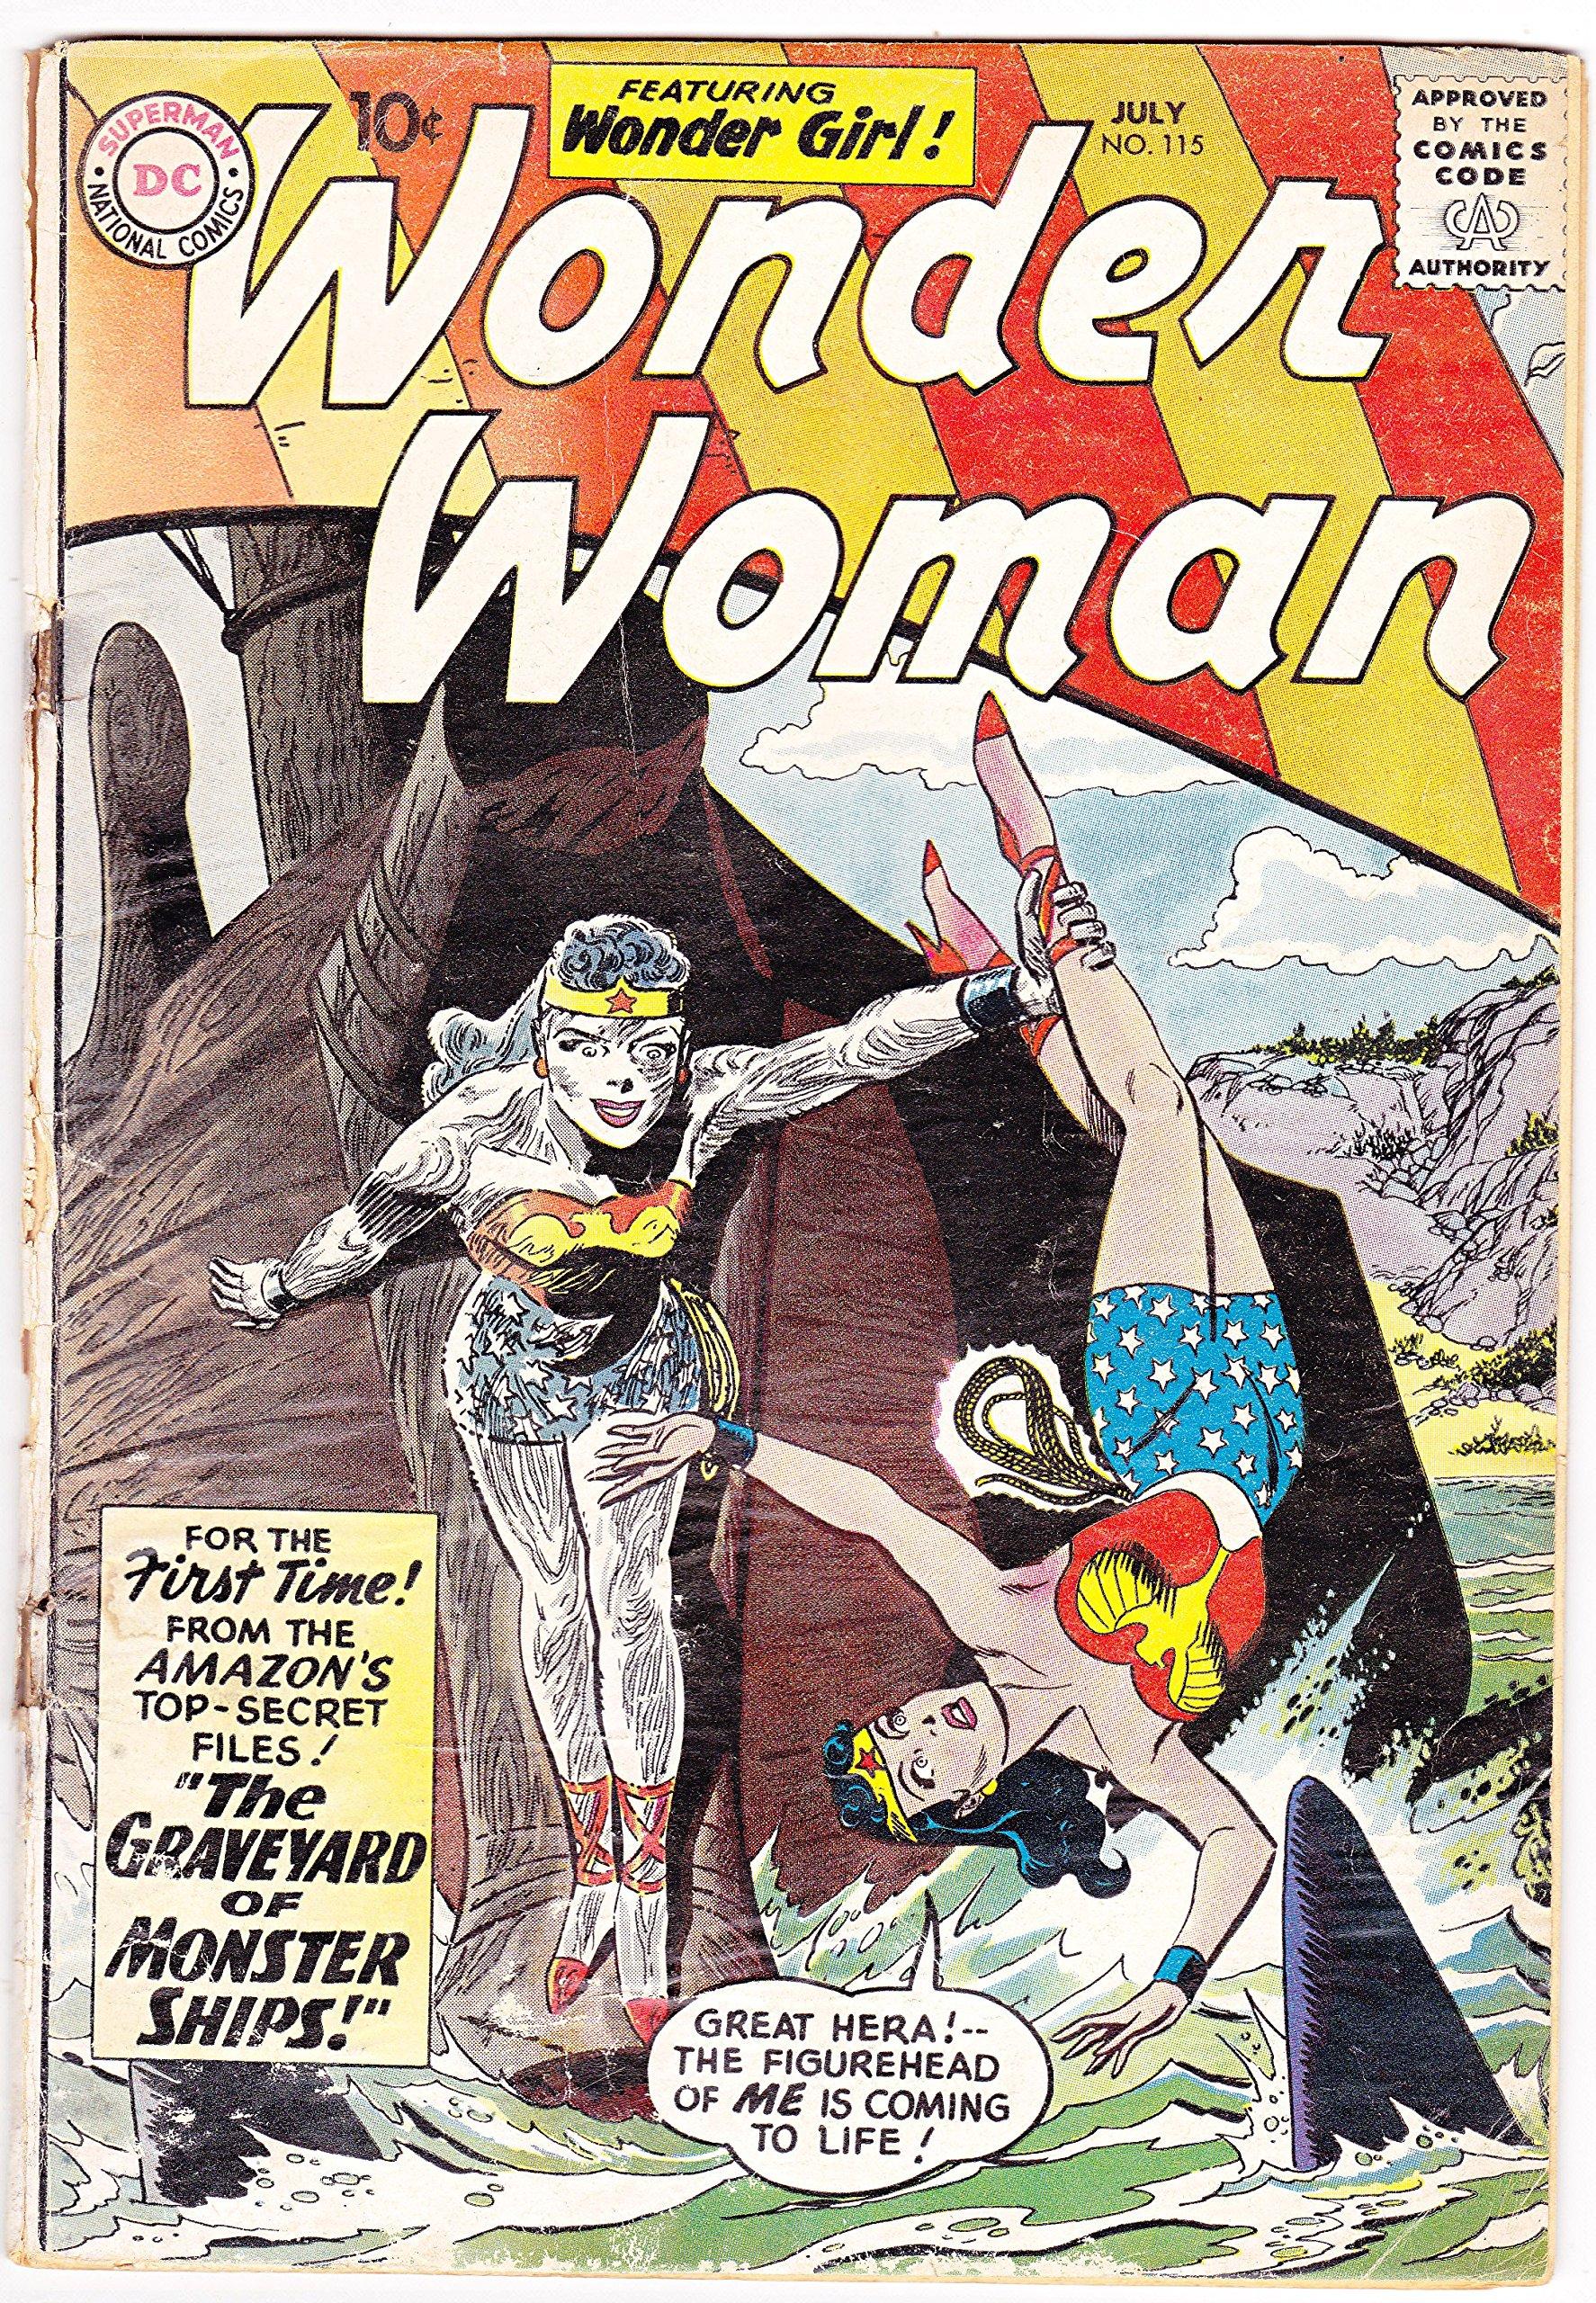 Wonder Woman #115, July 1960: DC Comics: Amazon.com: Books